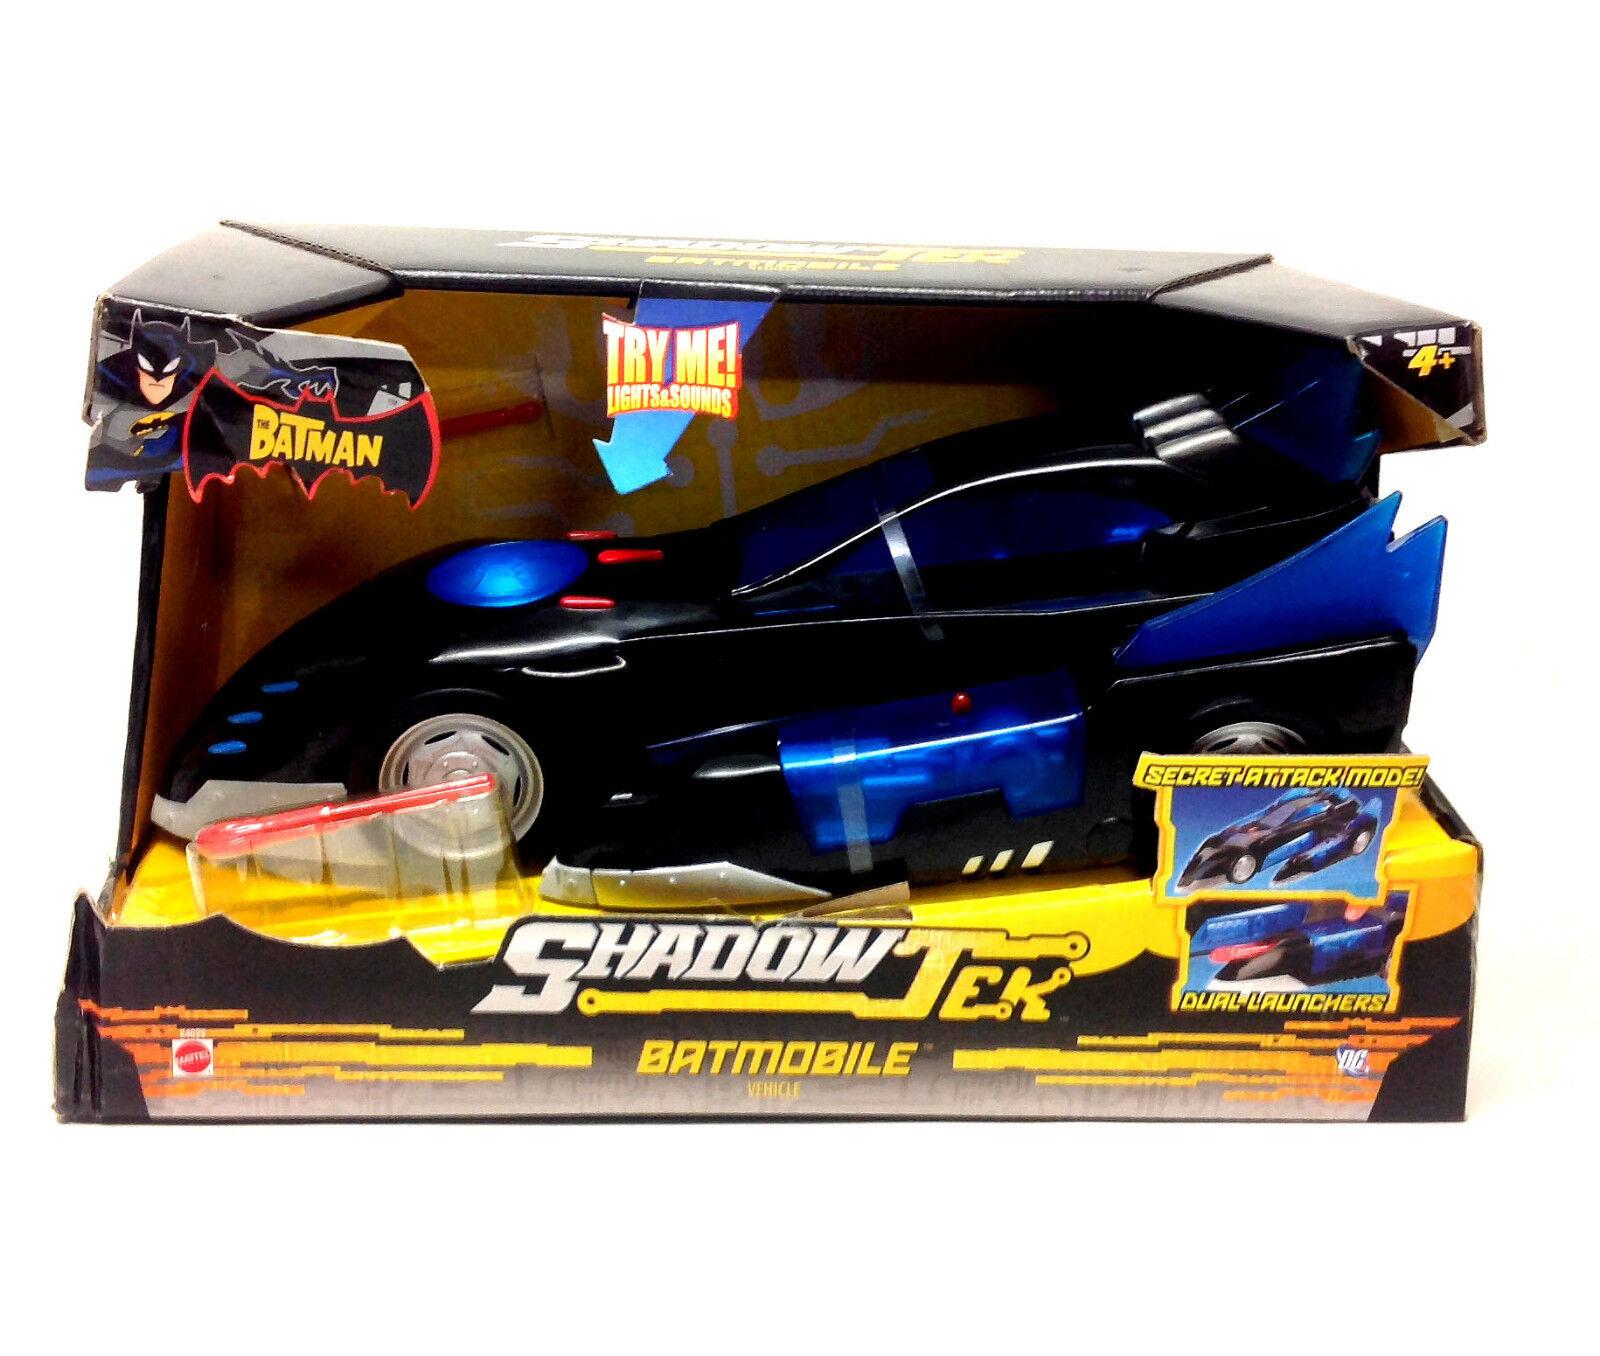 Dc comics batman shadotek batmobil auto licht und sound fx - spielzeug fr 5.